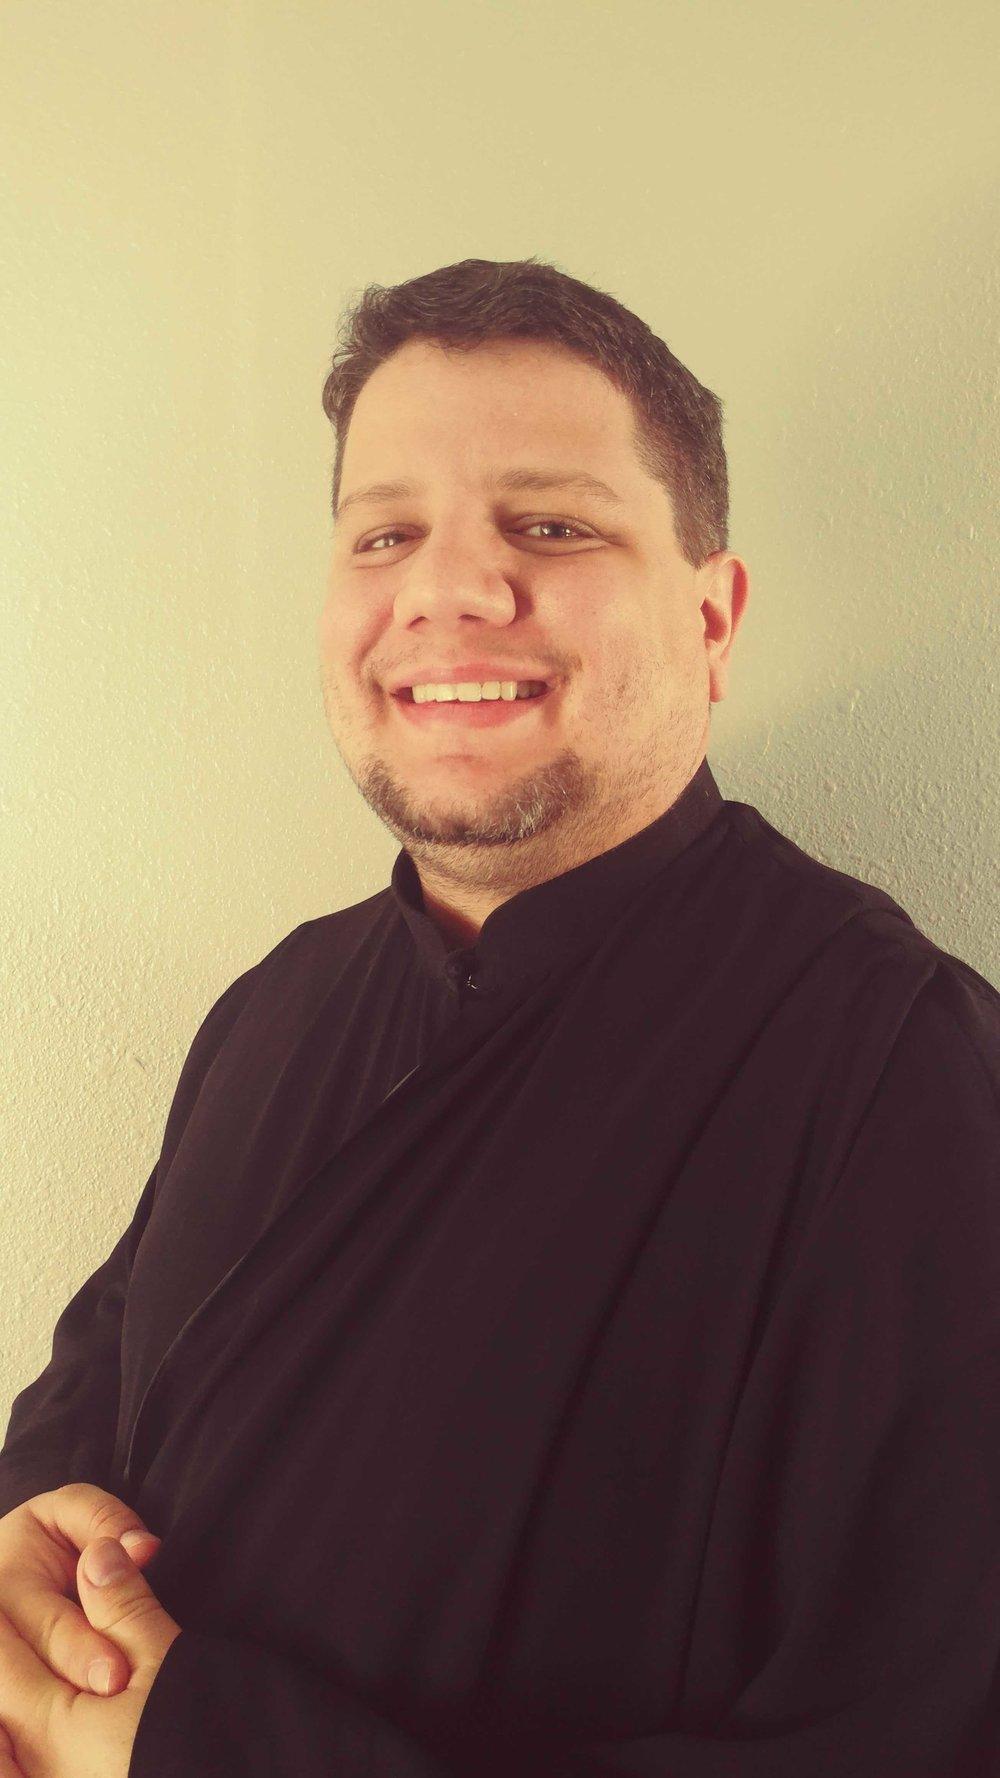 Samuel Herron - Byzantine Music Teacher